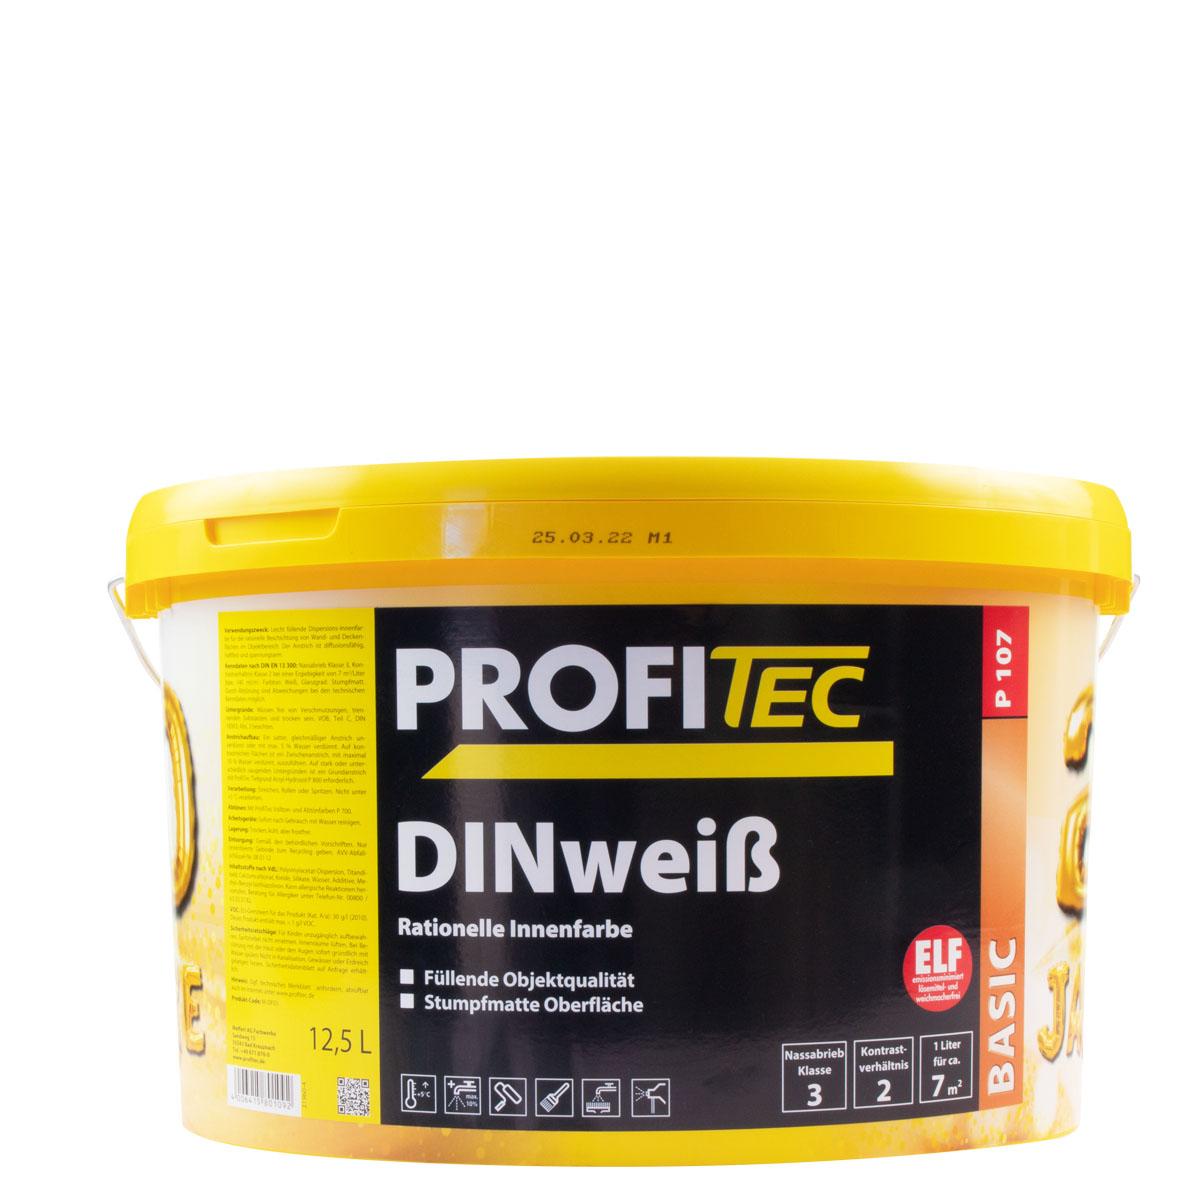 Profitec P107 DINweiß 12,5L ,stumpfmatt, rationelle Innenwandfarbe